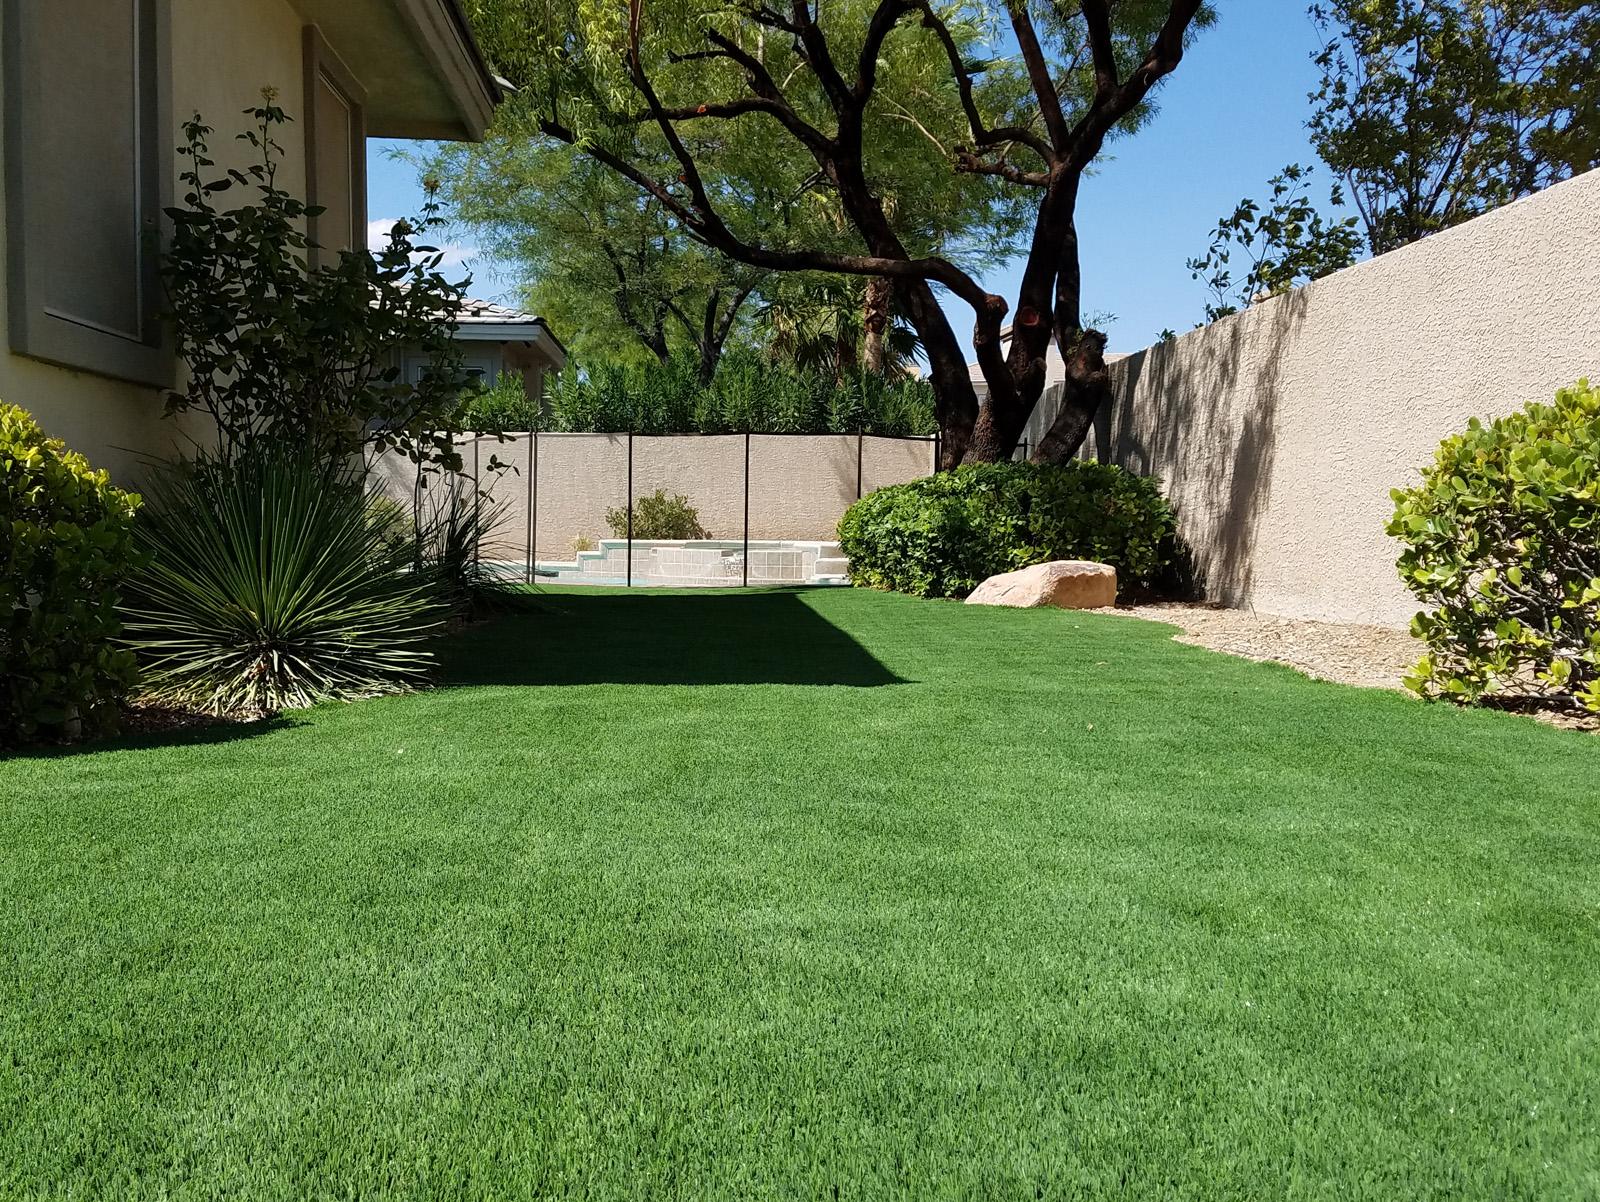 Synthetic Lawn Installation East Palo Alto California